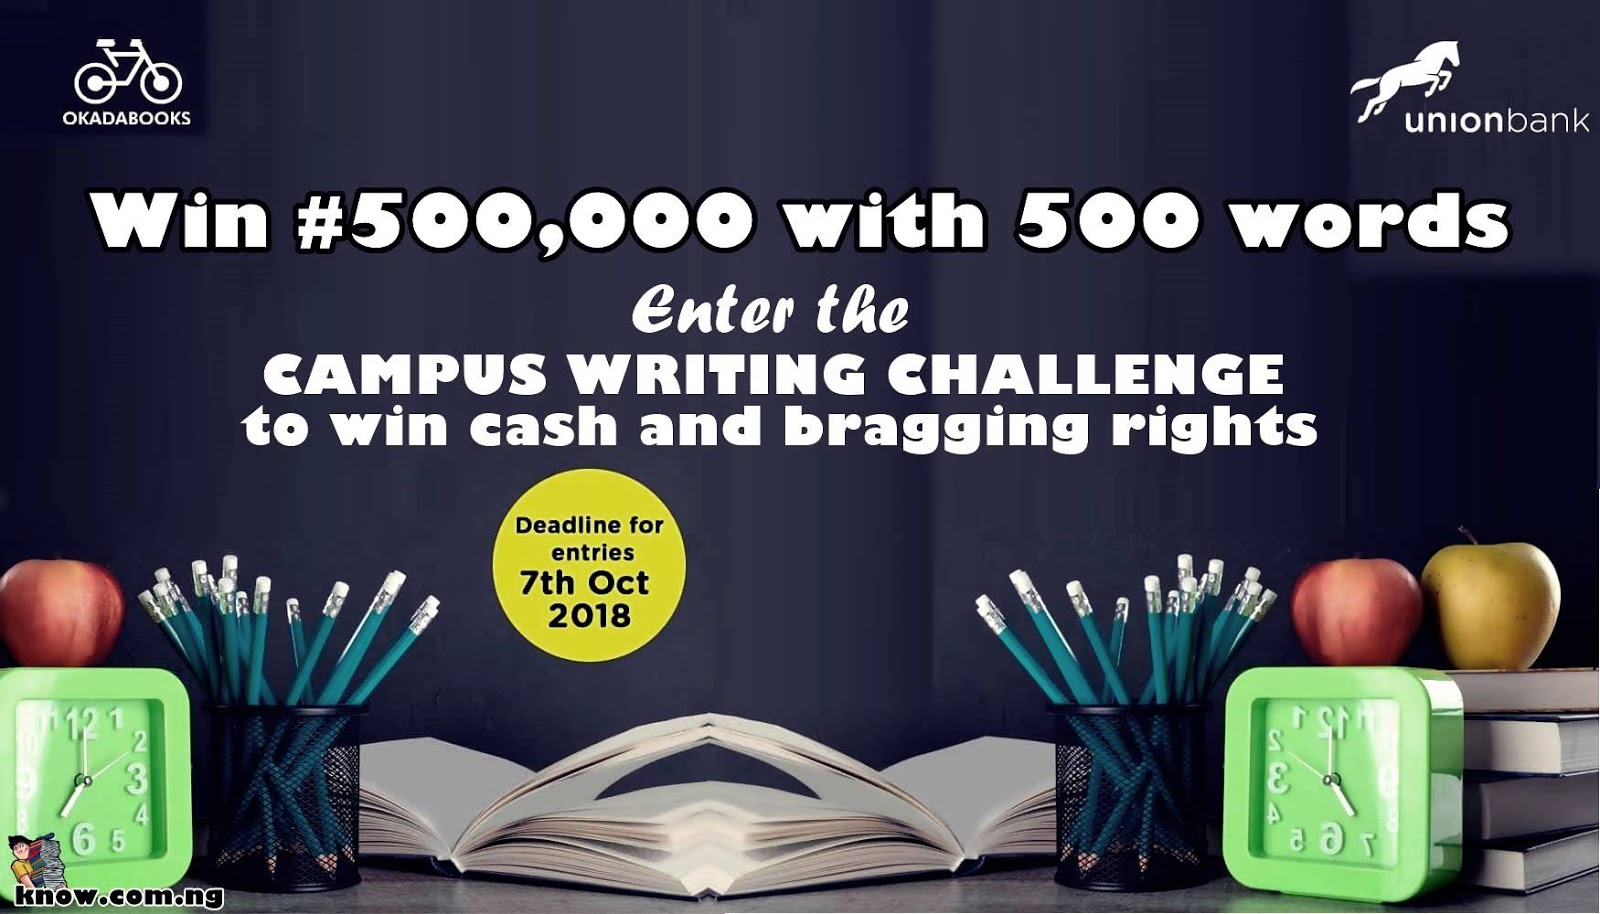 Okadabooks And Union Bank Campus Writing Challenge